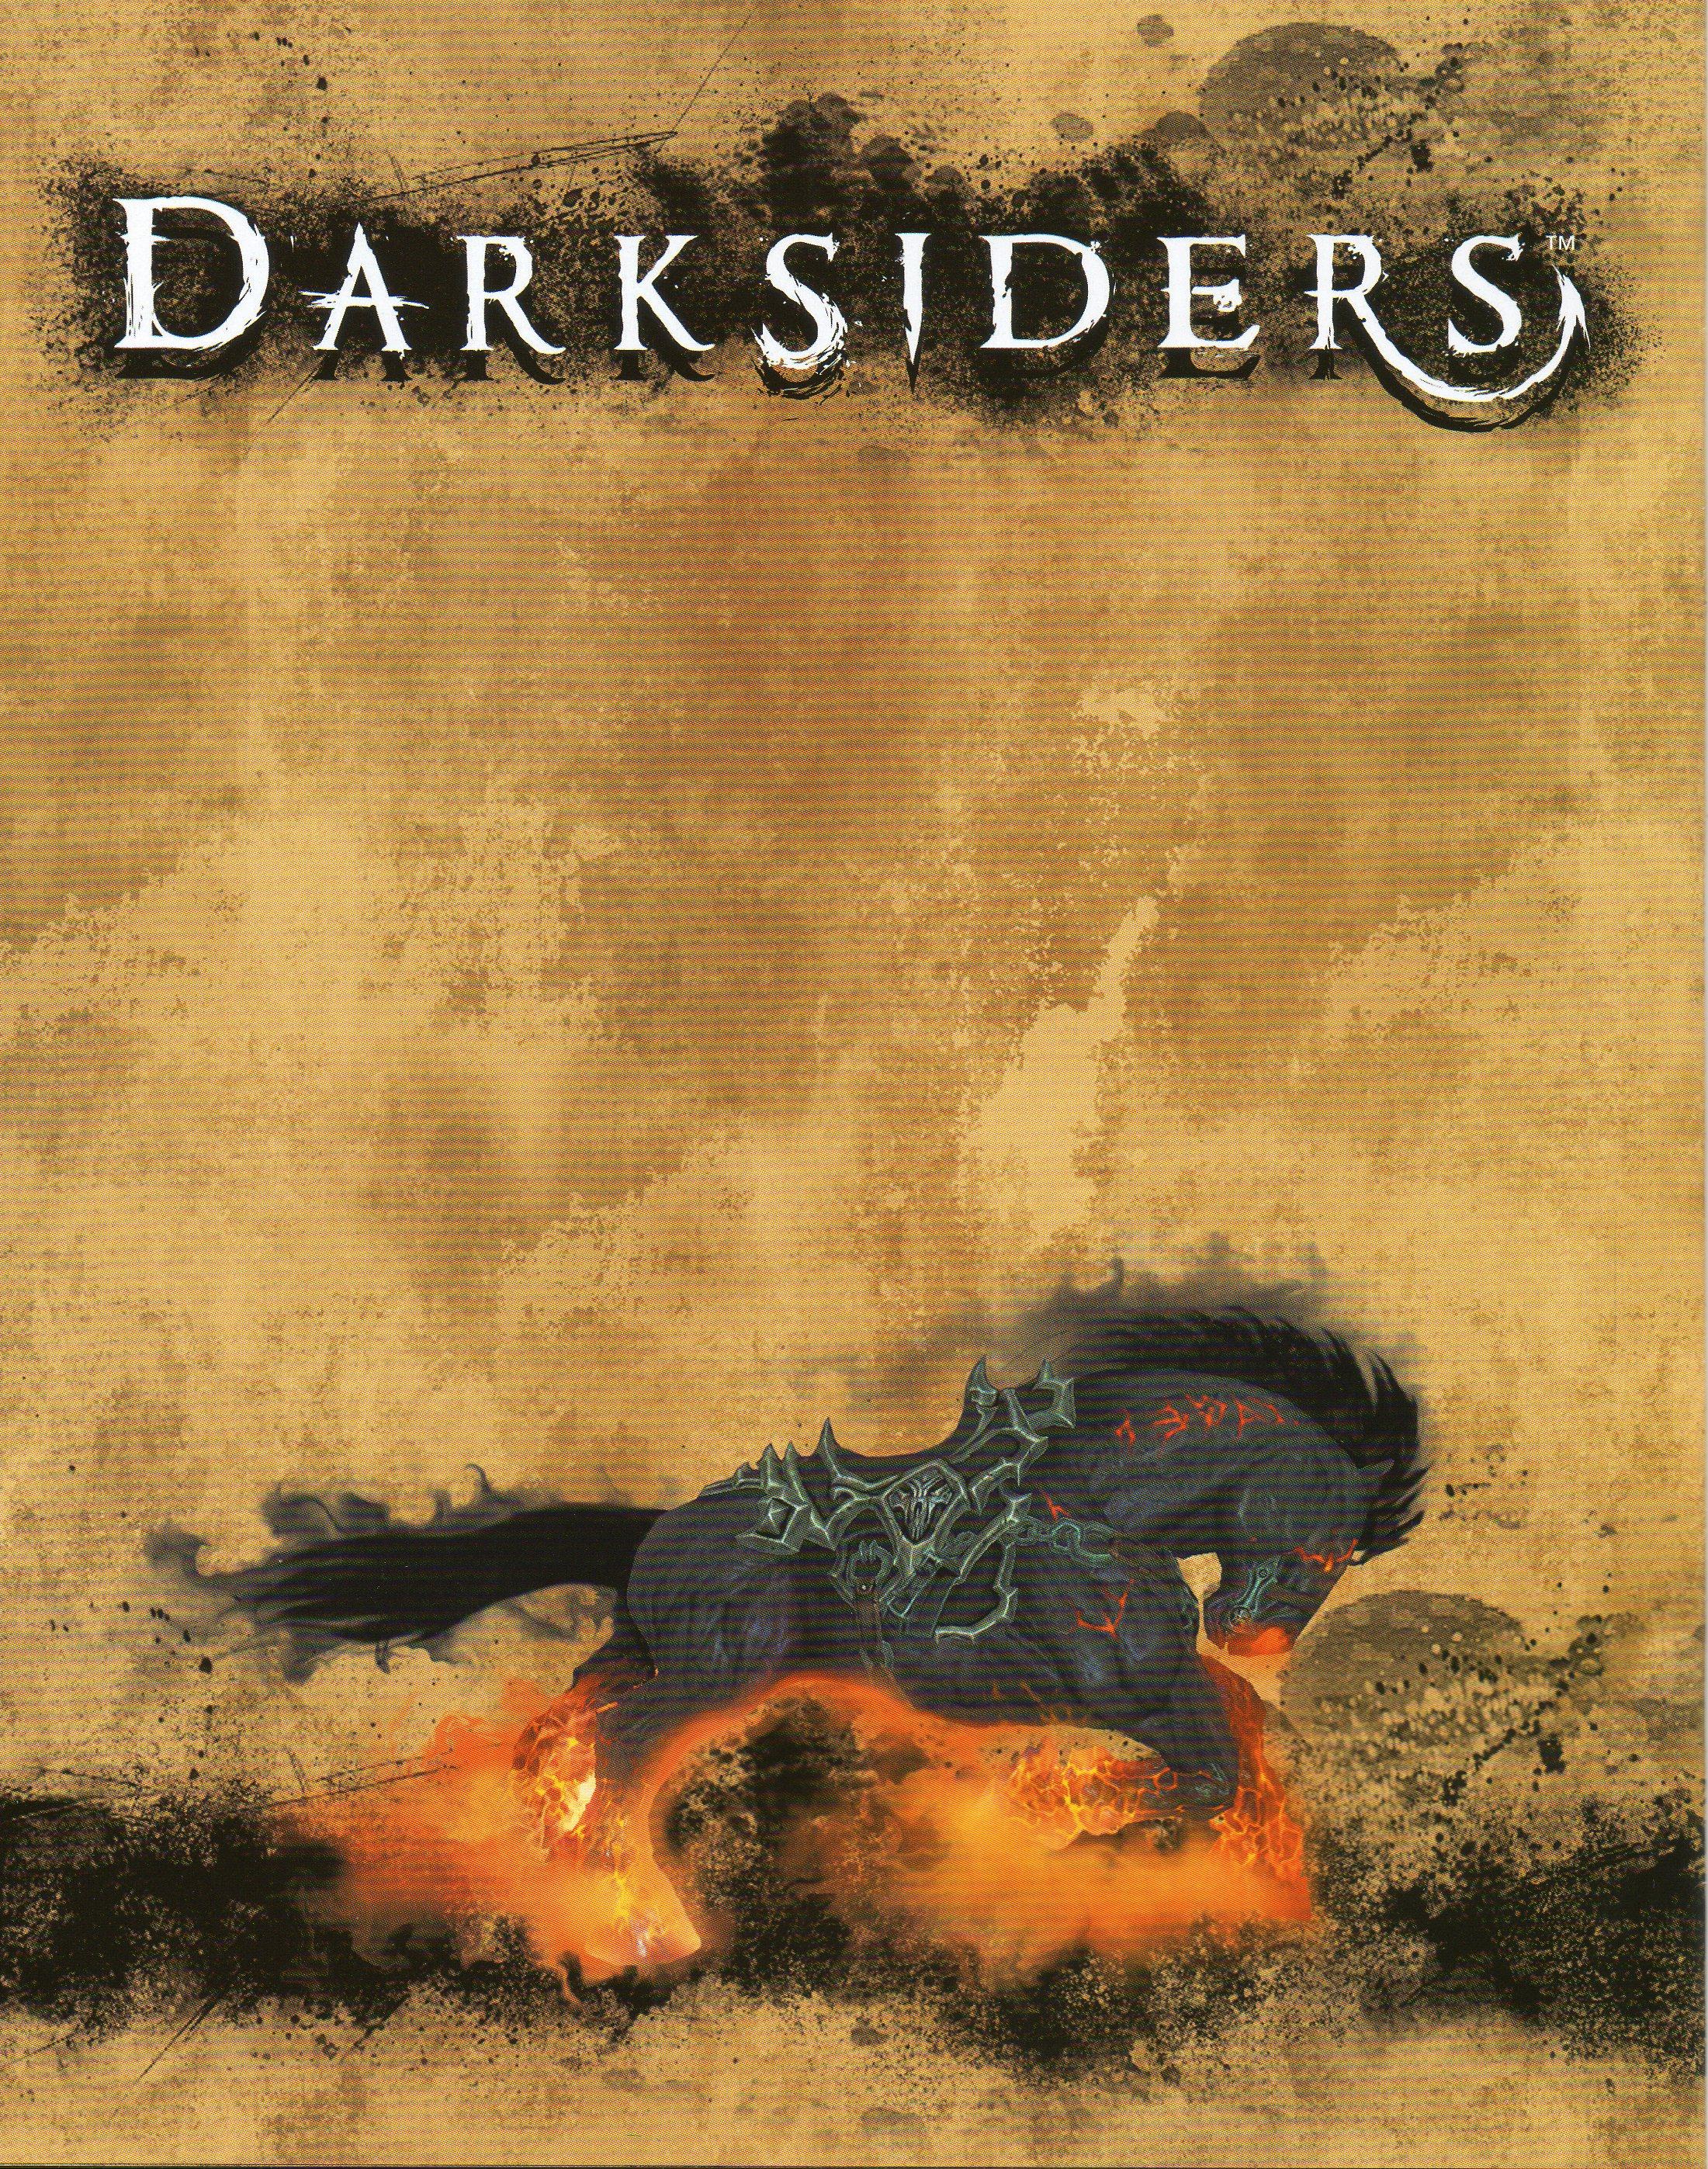 Read online Darksiders comic -  Issue # Full - 4